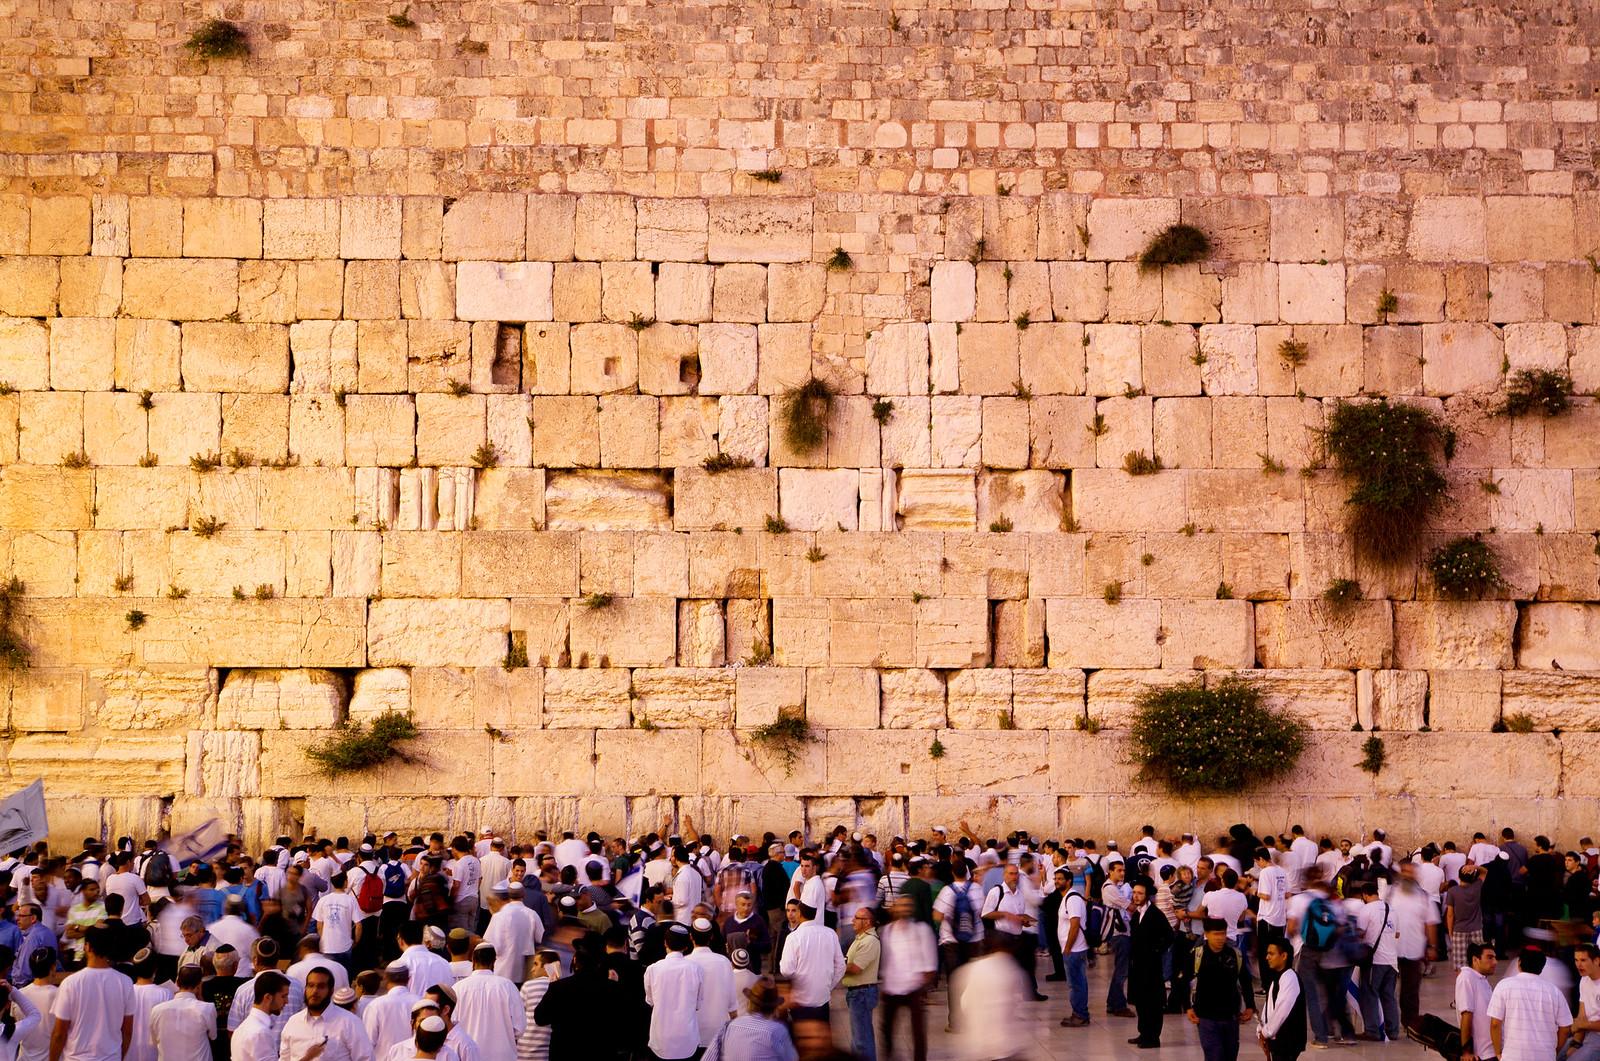 Jerusalem_Western Wall_3_Noam Chen_IMOT